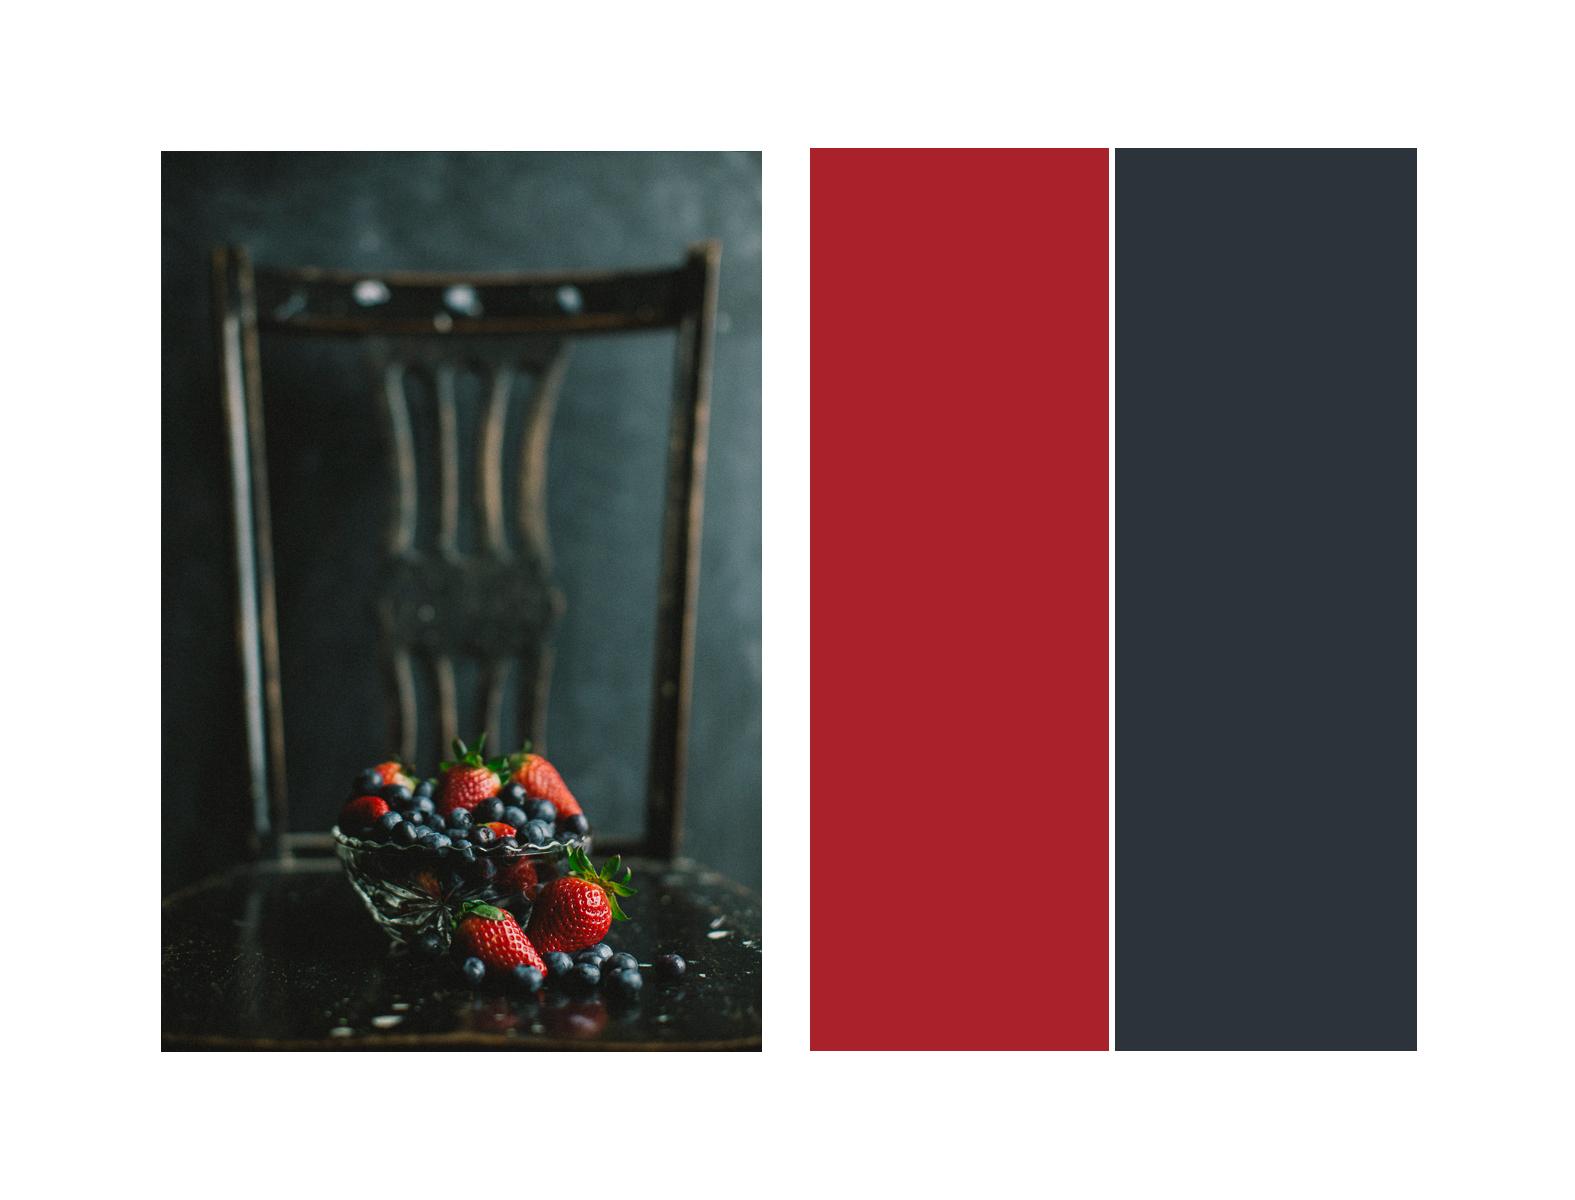 stawberryblueberry.jpg